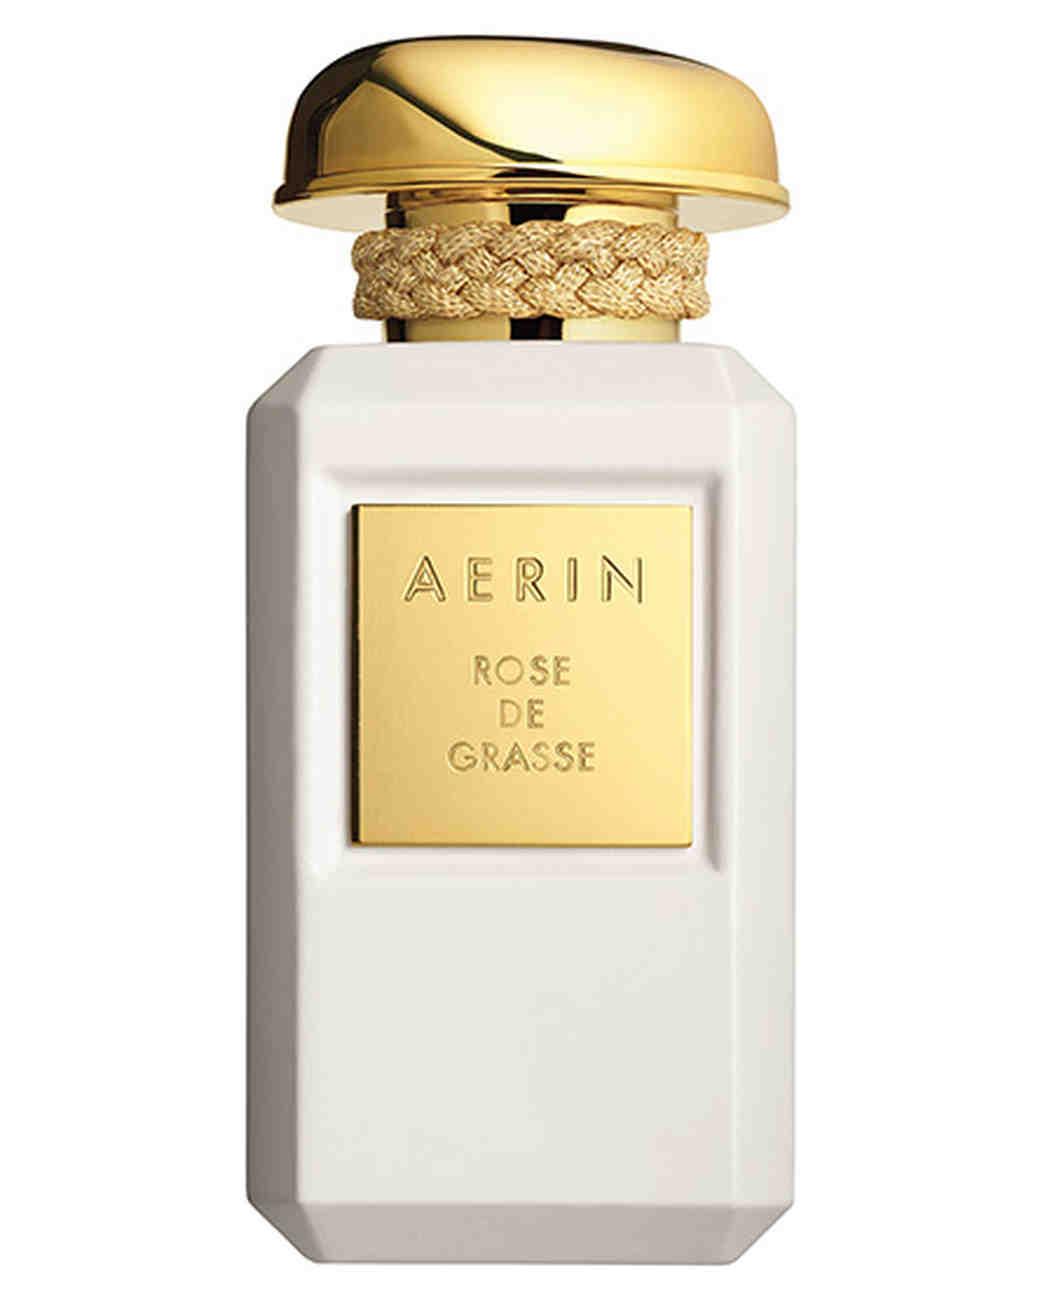 rose-beauty-products-aerin-rose-de-grasse-parfum-0615.jpg